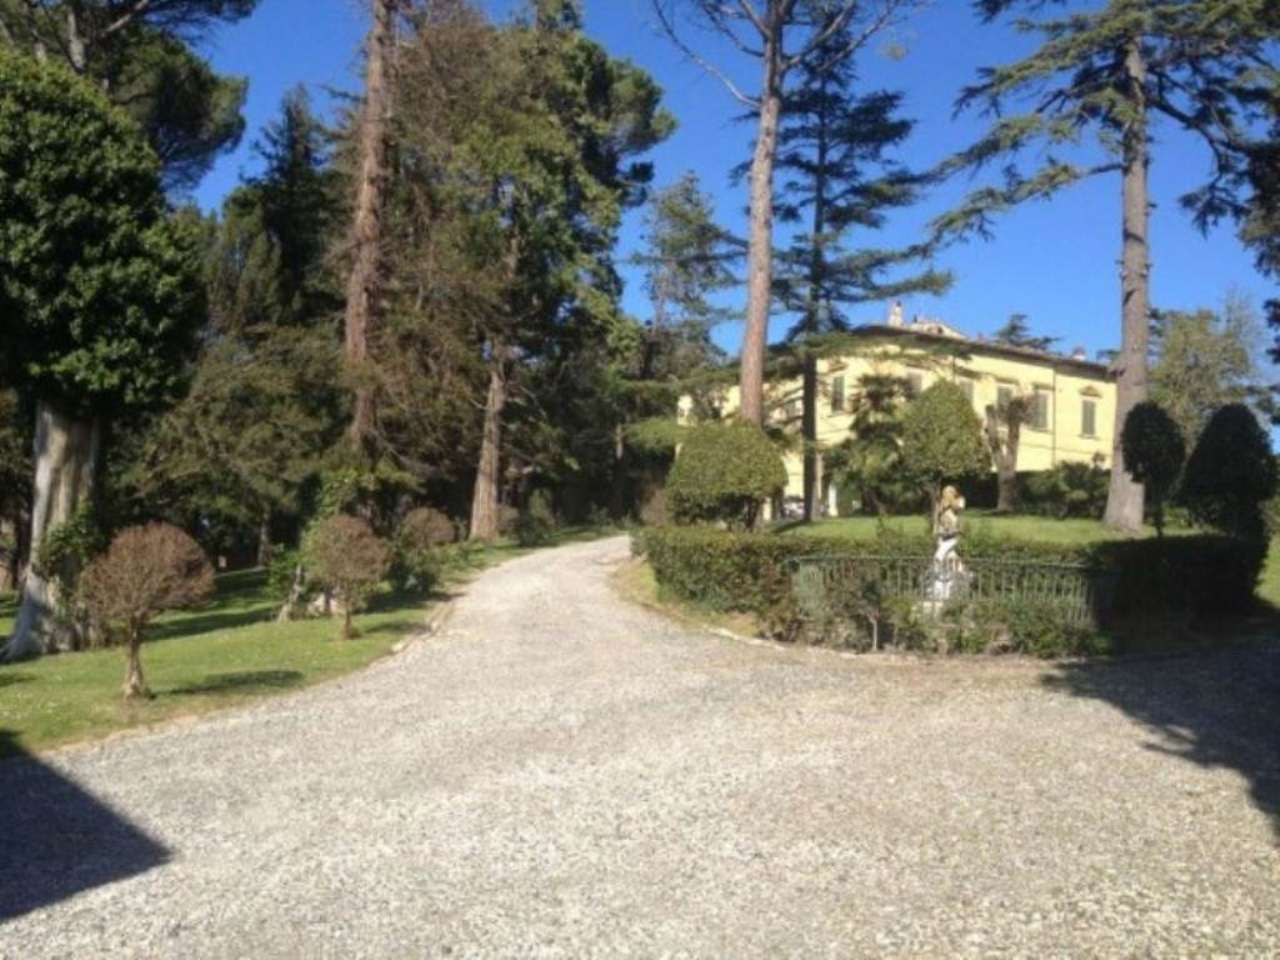 Villa piscina camera lorenzana in vendita waa2 for Casa di 700 metri quadrati in vendita